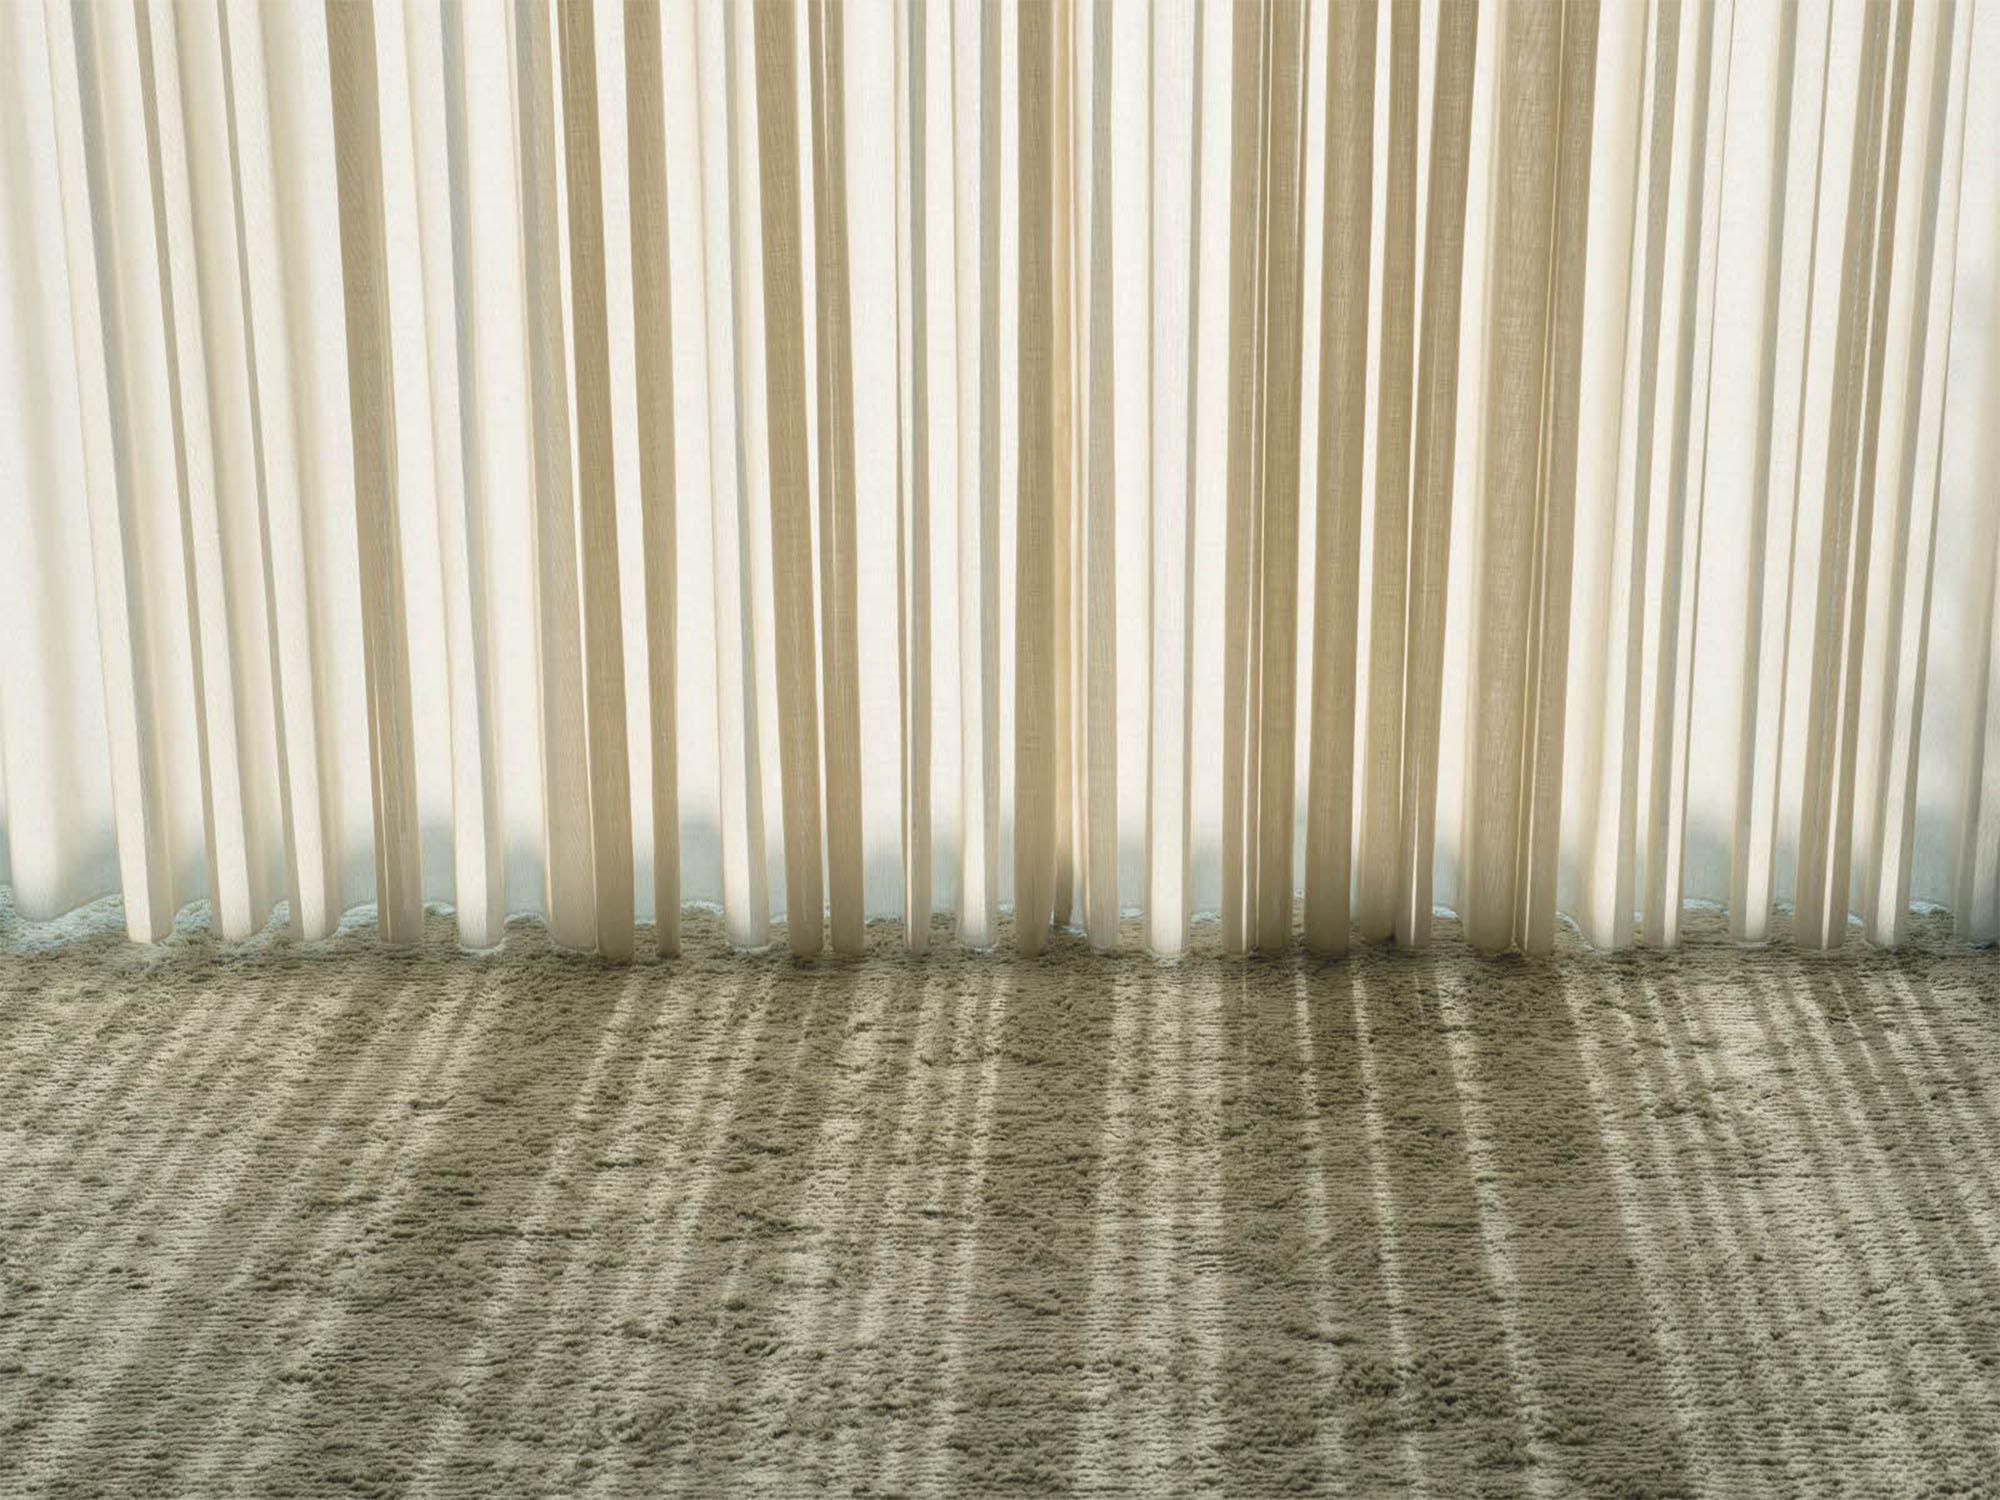 curtains_0001_Unity_005